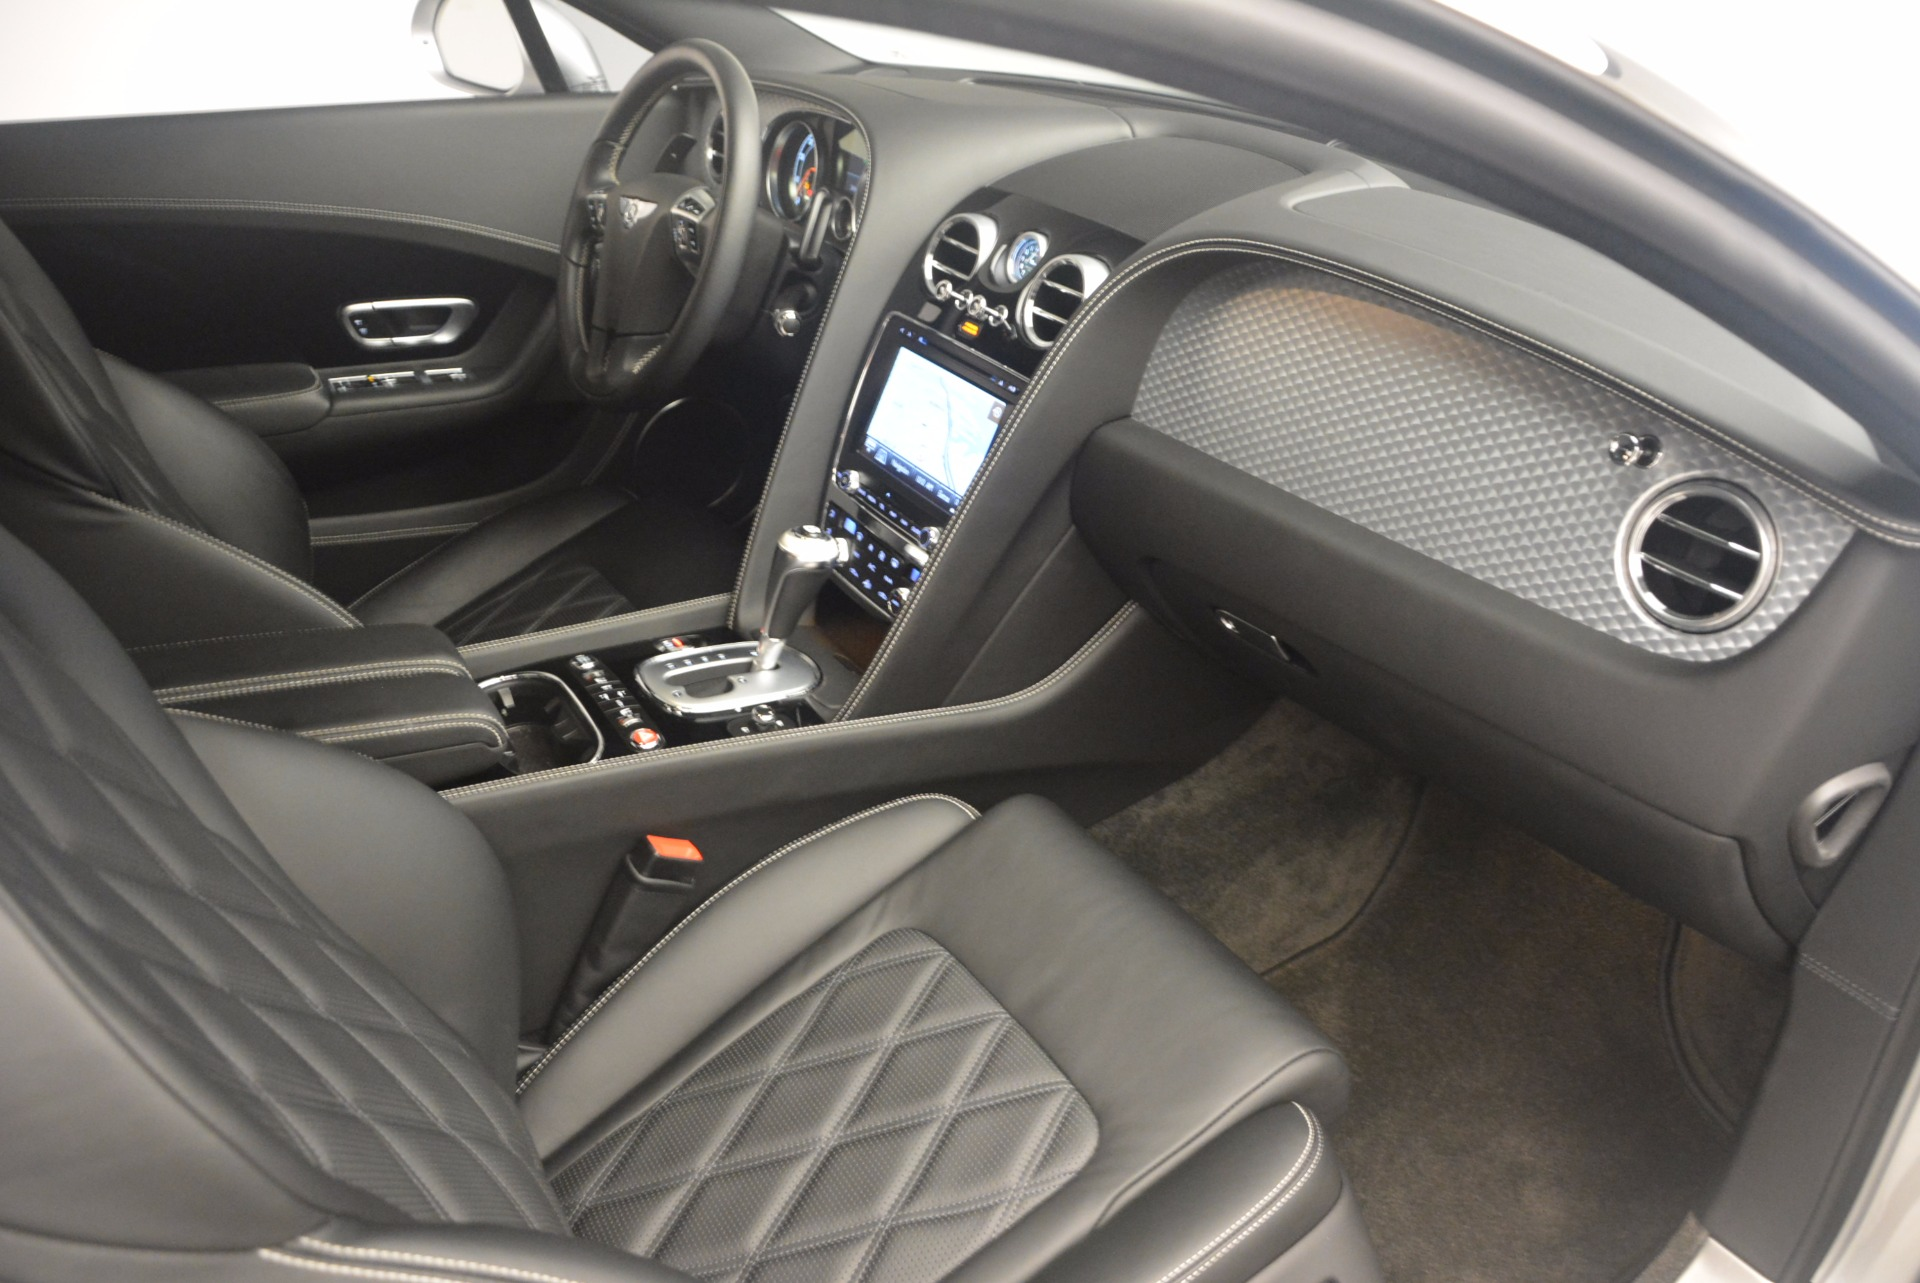 Used 2012 Bentley Continental GT  For Sale In Westport, CT 1176_p34